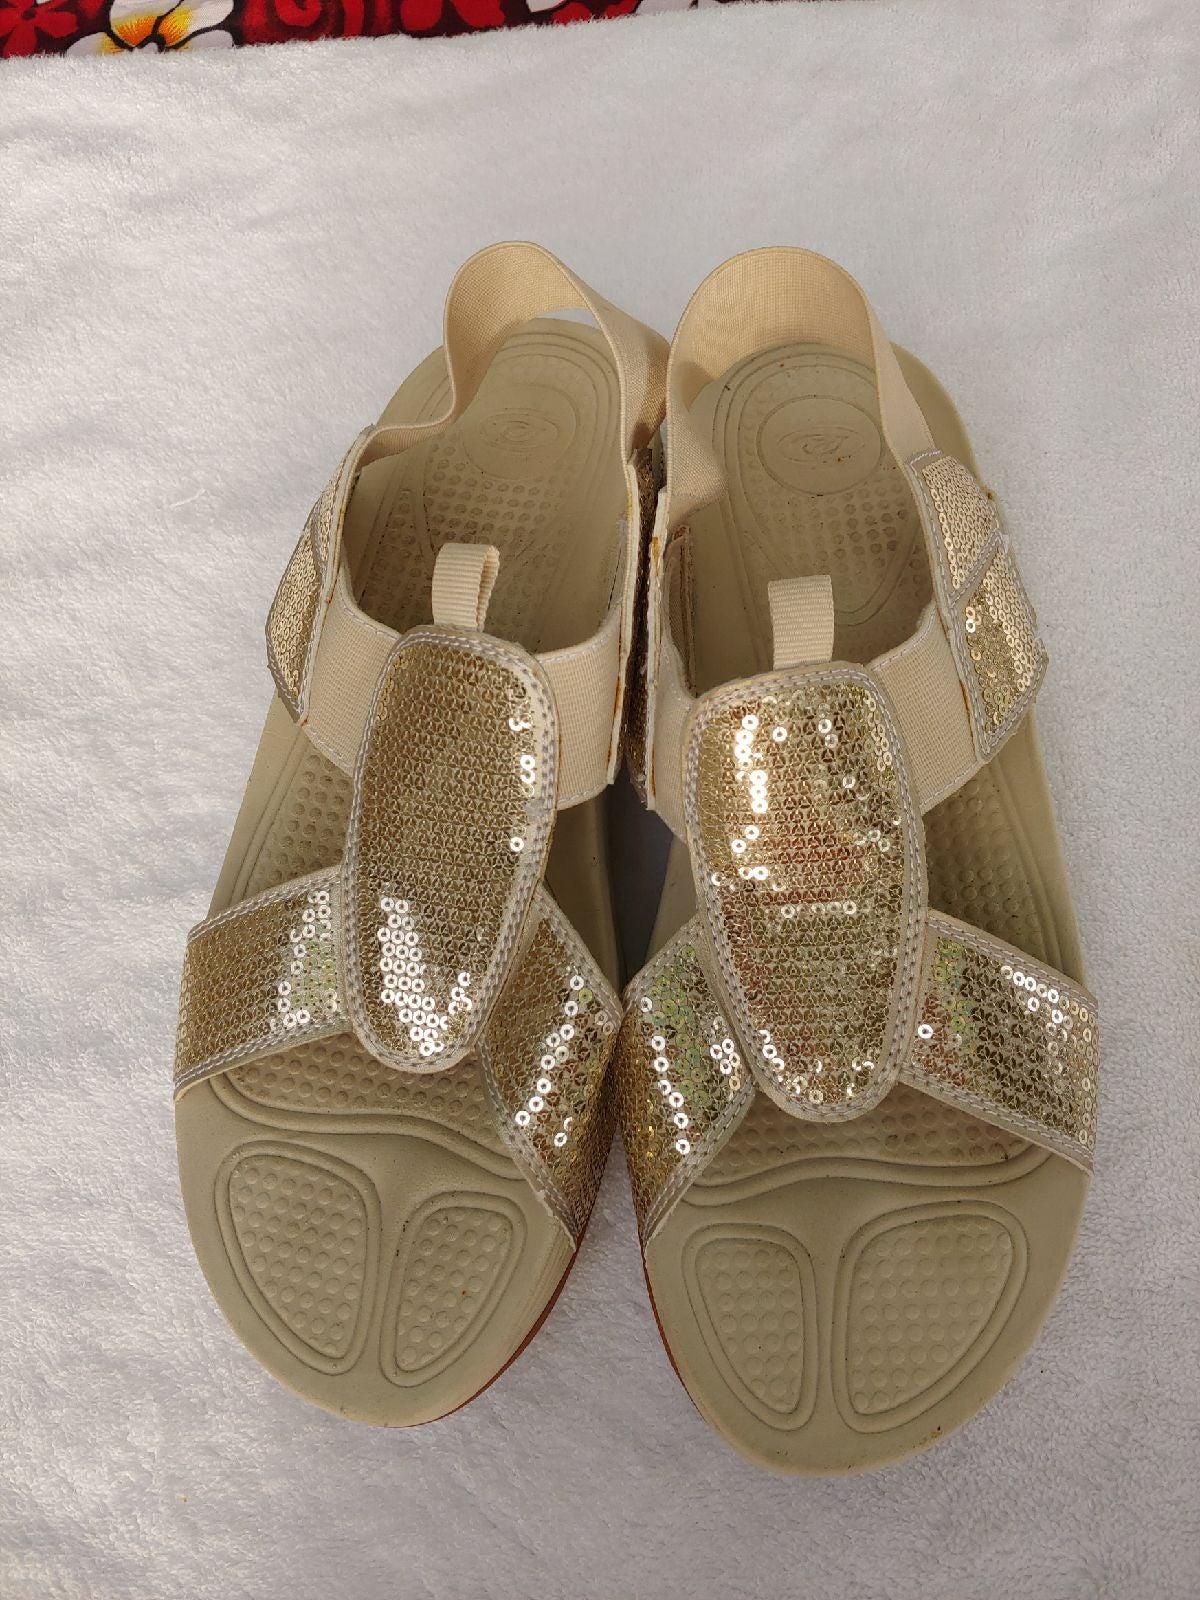 Easy Spirit Gold Sequin Beige Sandals 10